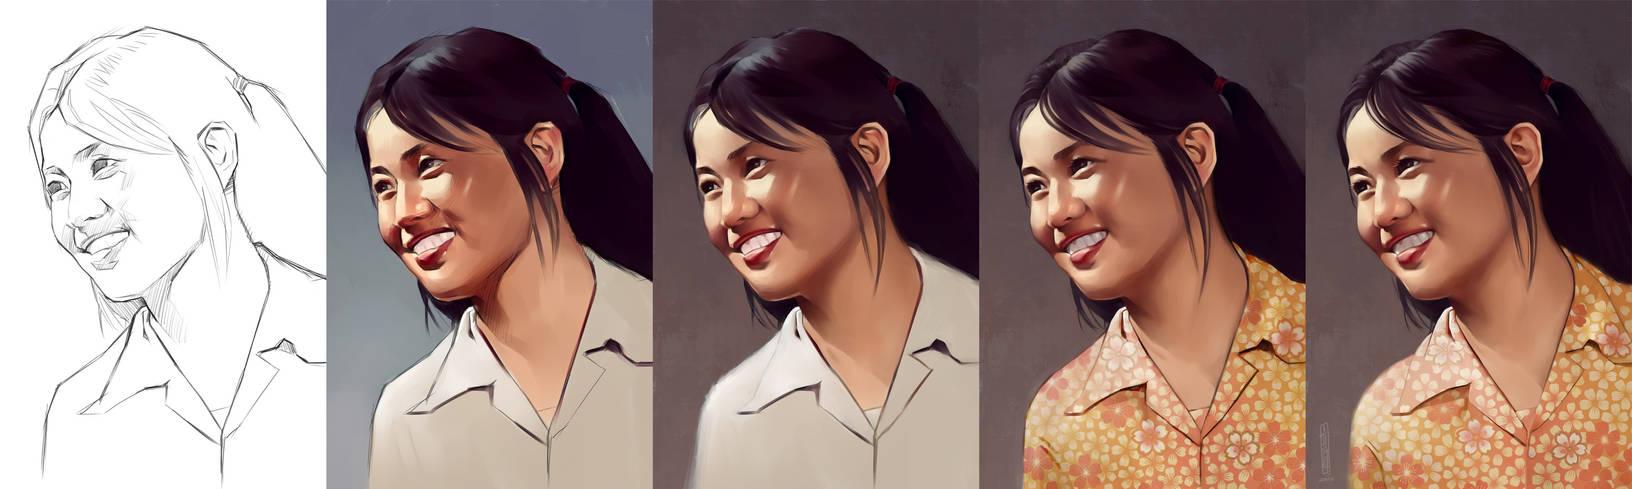 Grandma Portrait process